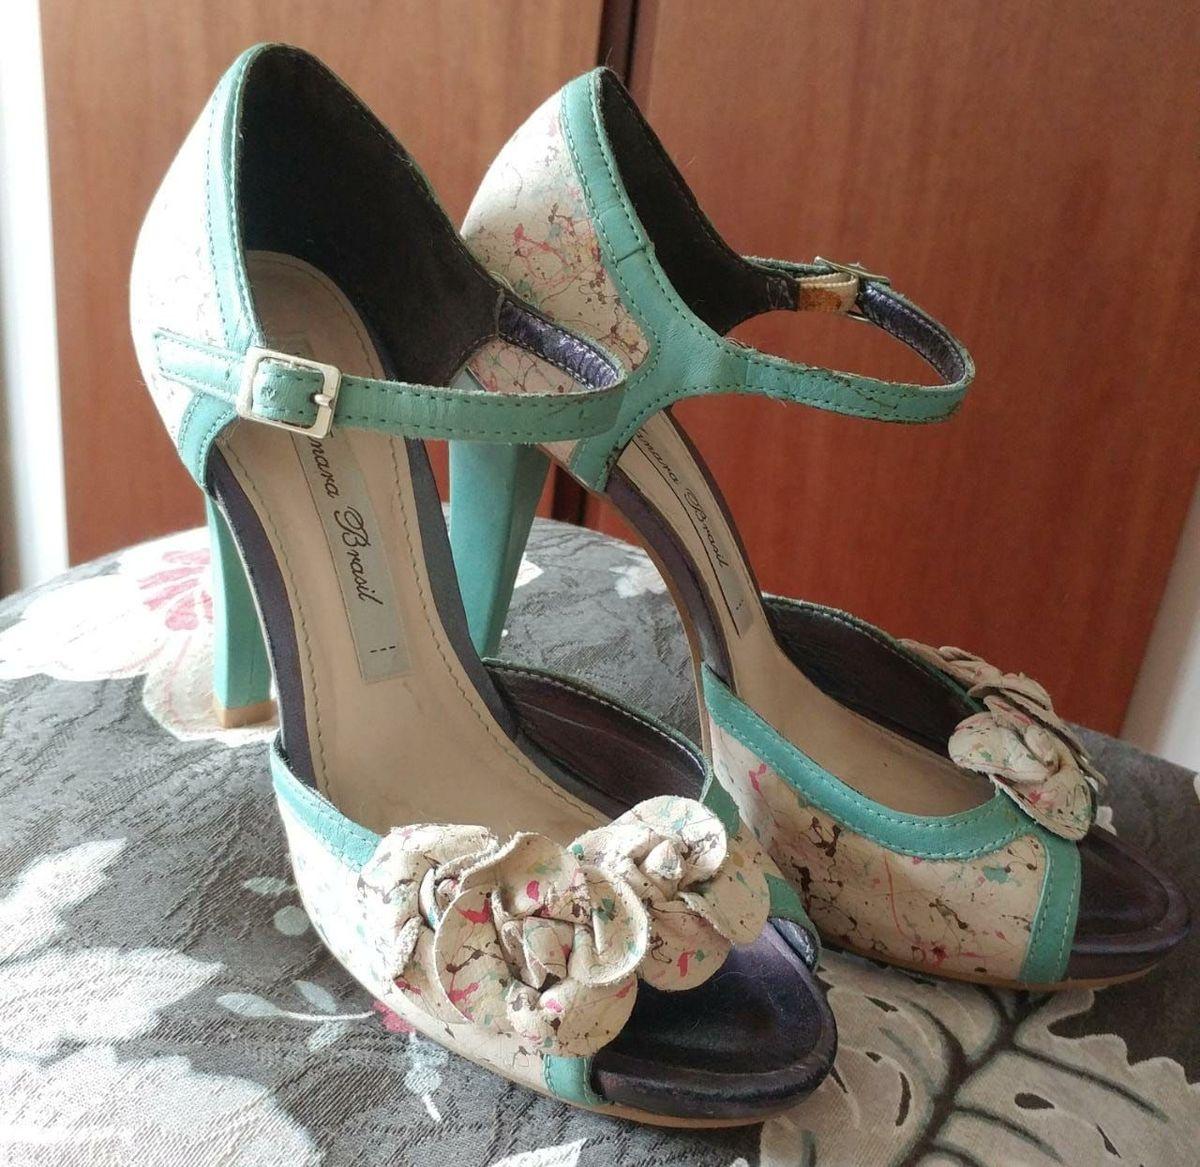 ece4c7c74 sandália tanara estilosa - sandálias tanara brasil.  Czm6ly9wag90b3muzw5qb2vplmnvbs5ici9wcm9kdwn0cy8xmjqxndcvntkwyzixmzhkndu1mjm0nwfknmm0mzqwmda2mtq3mdauanbn